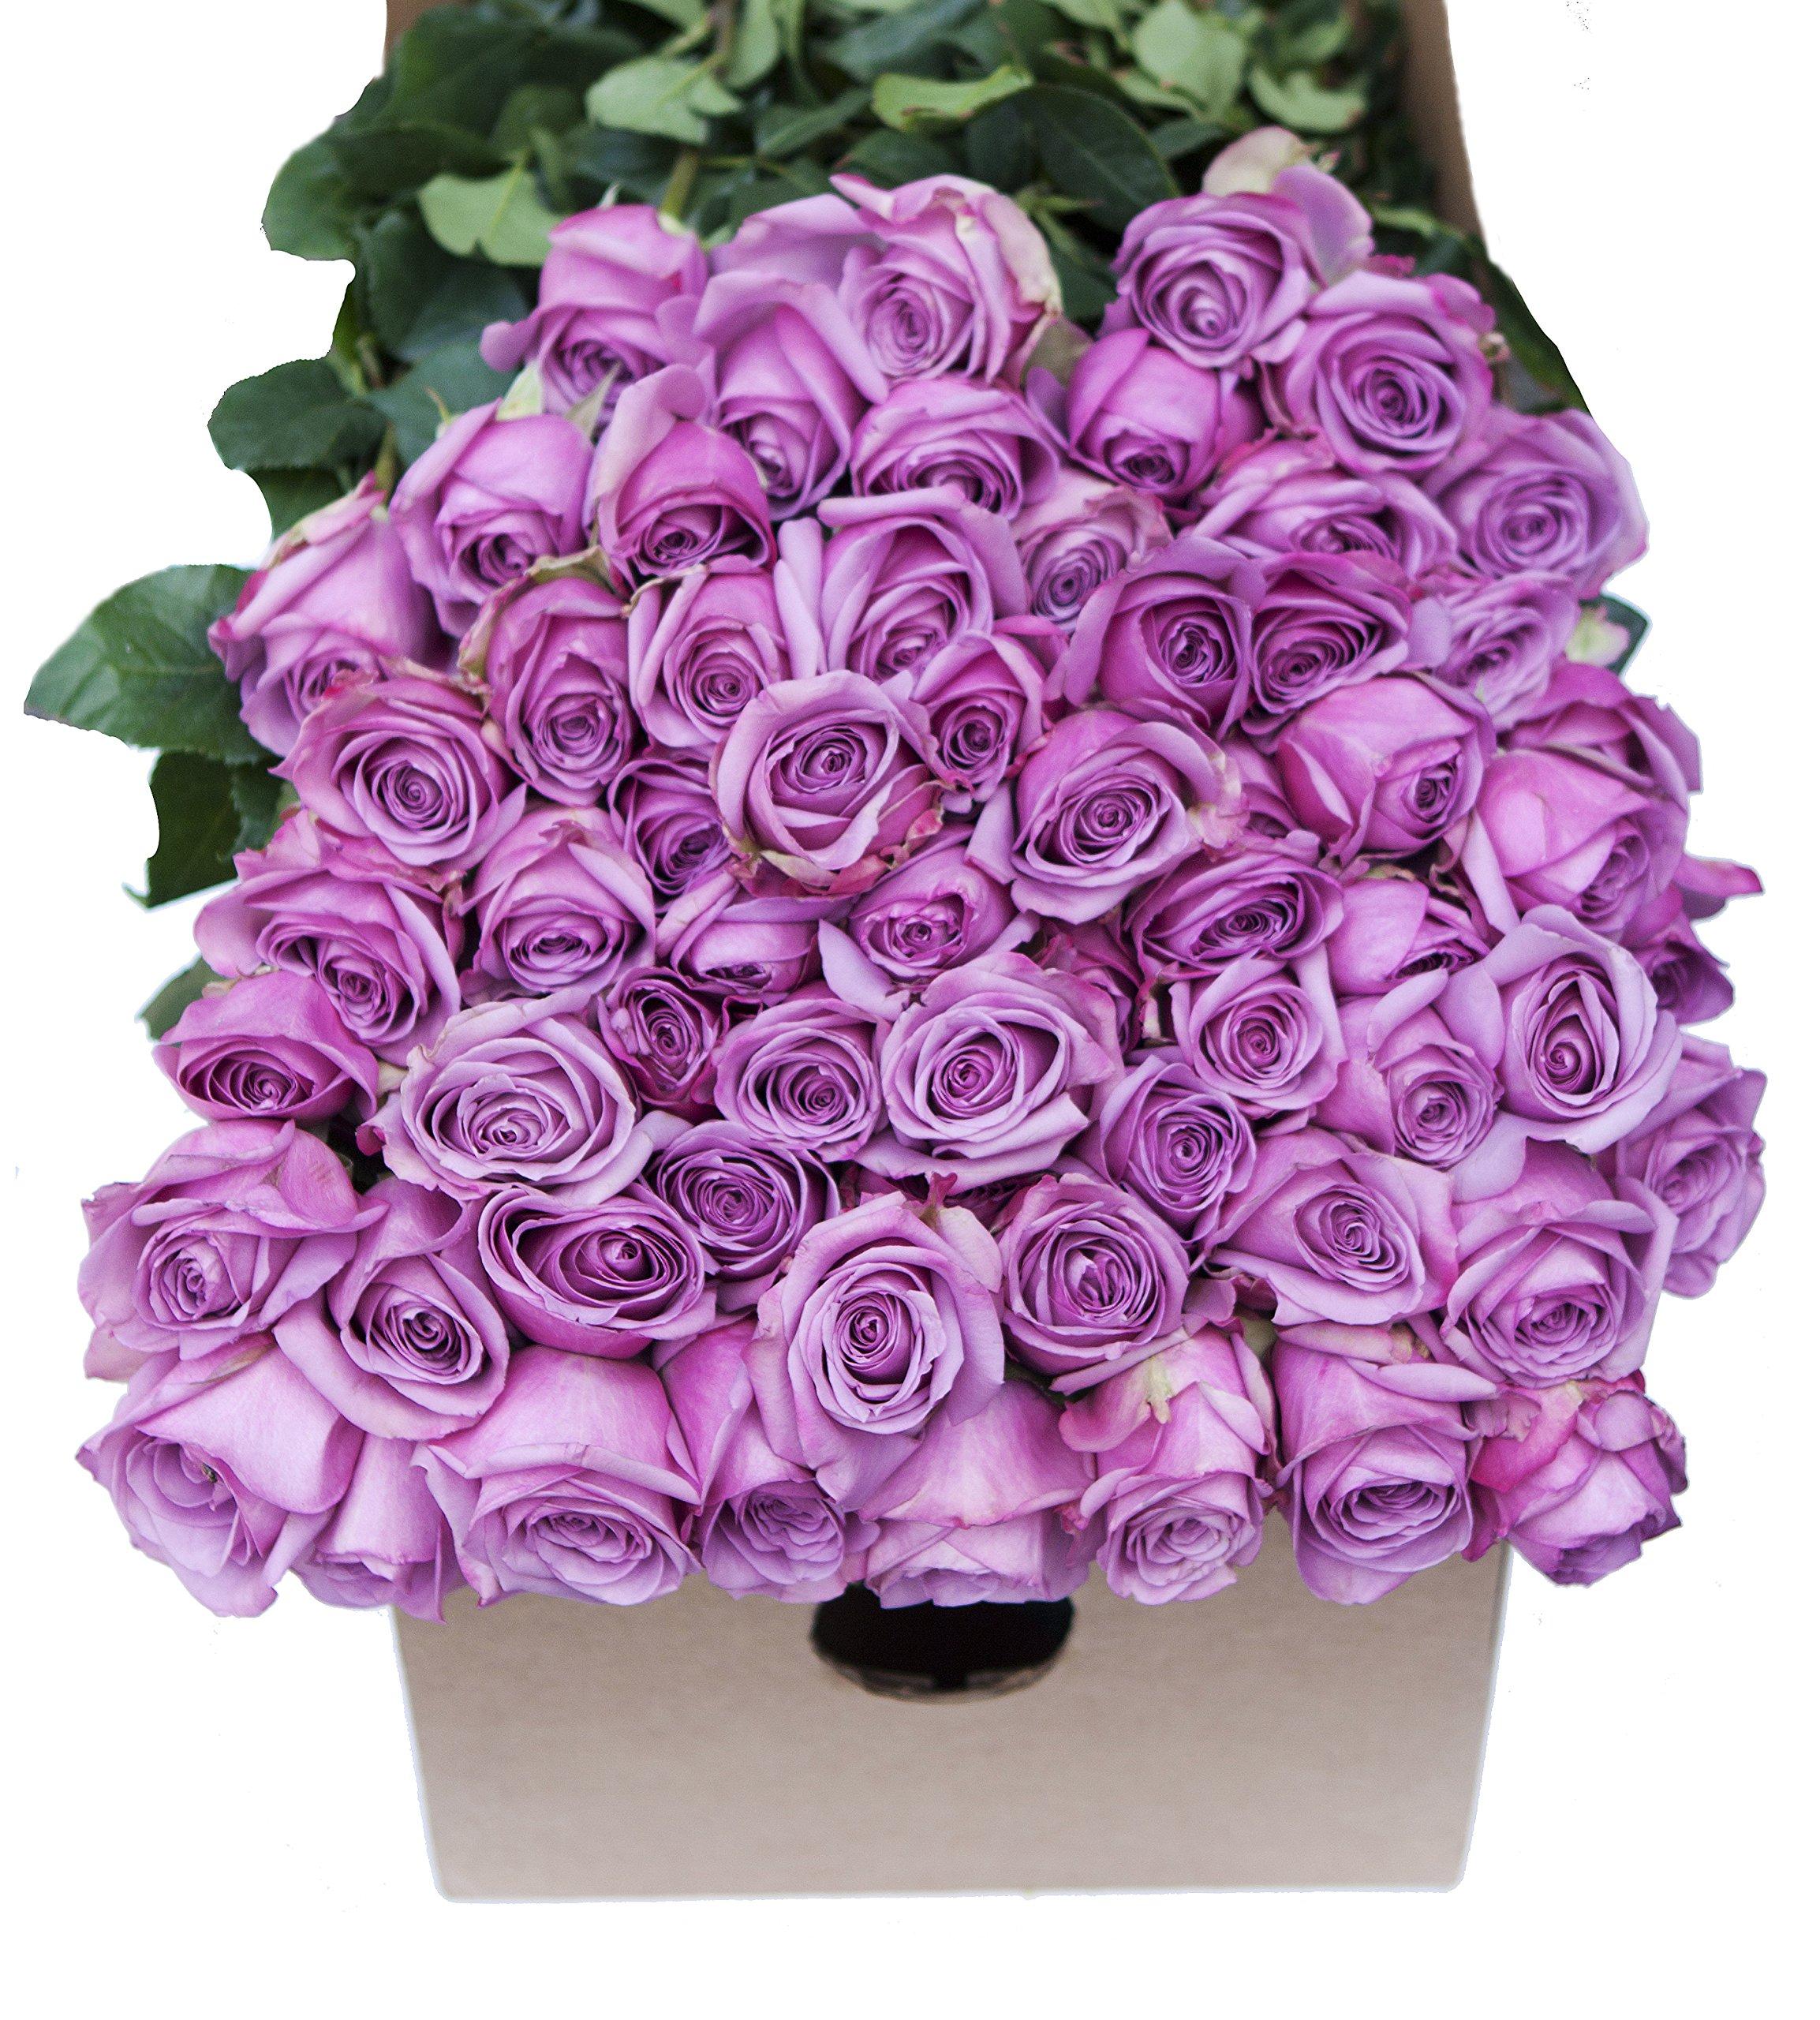 Blooms2Door 25 Purple Roses (Farm-Fresh, Long Stem - 50cm) - Farm Direct Wholesale Fresh Flowers